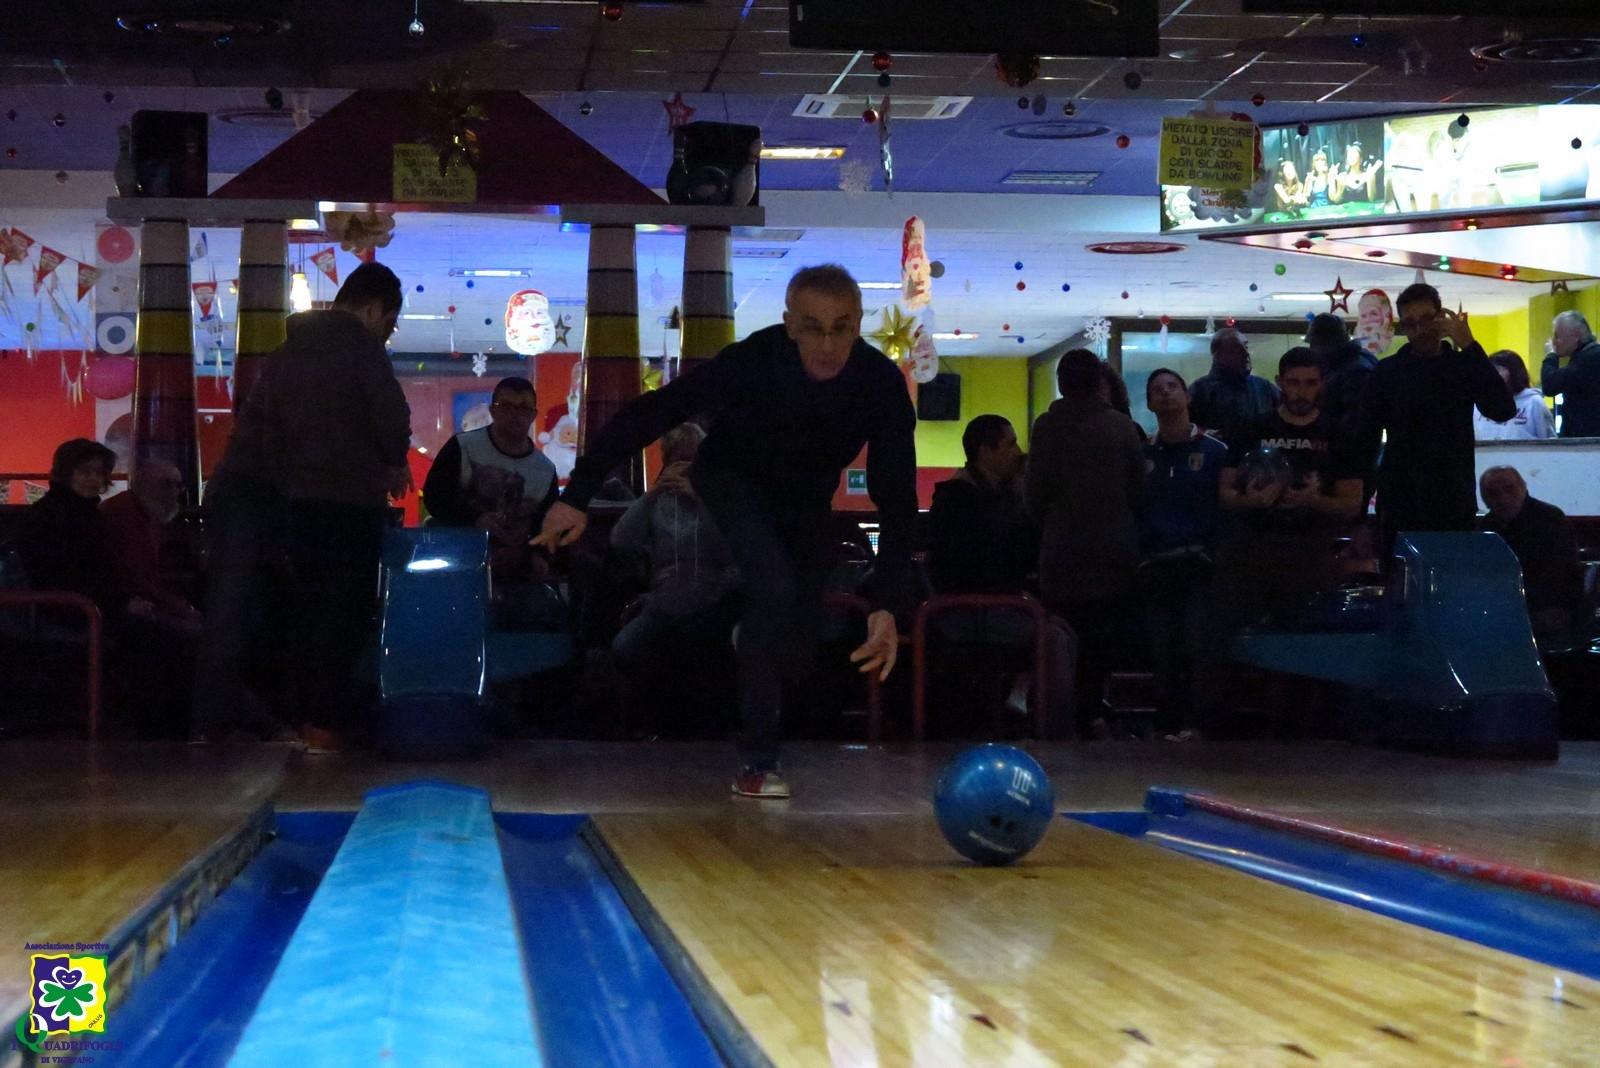 Torneo Bowling Vigevano 19-12-2018 - 040